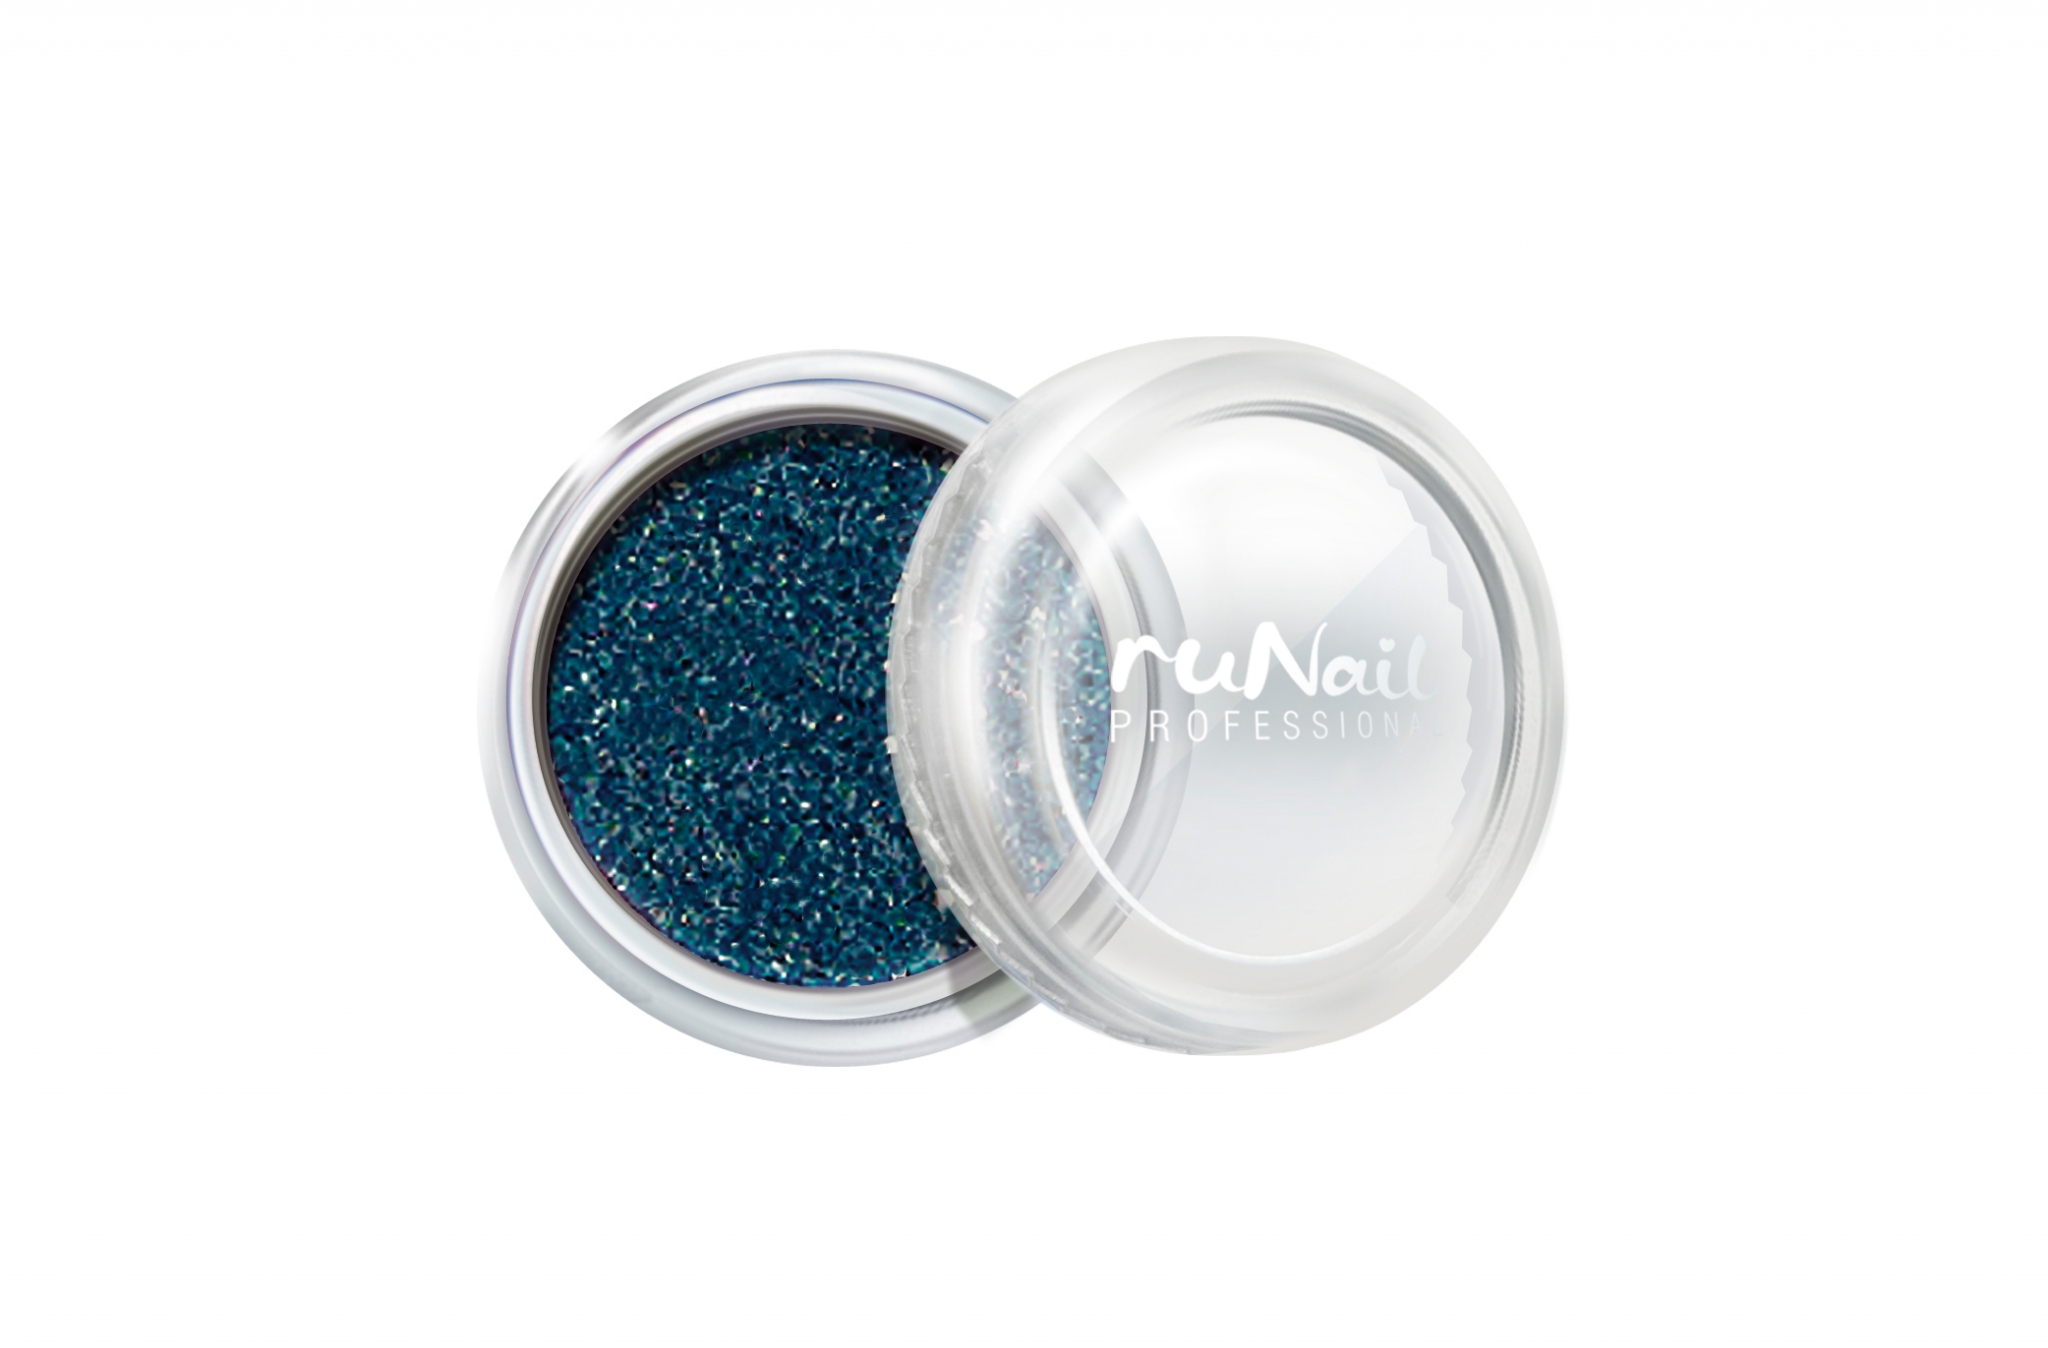 Дизайн для ногтей: зеркальная пыль №4290